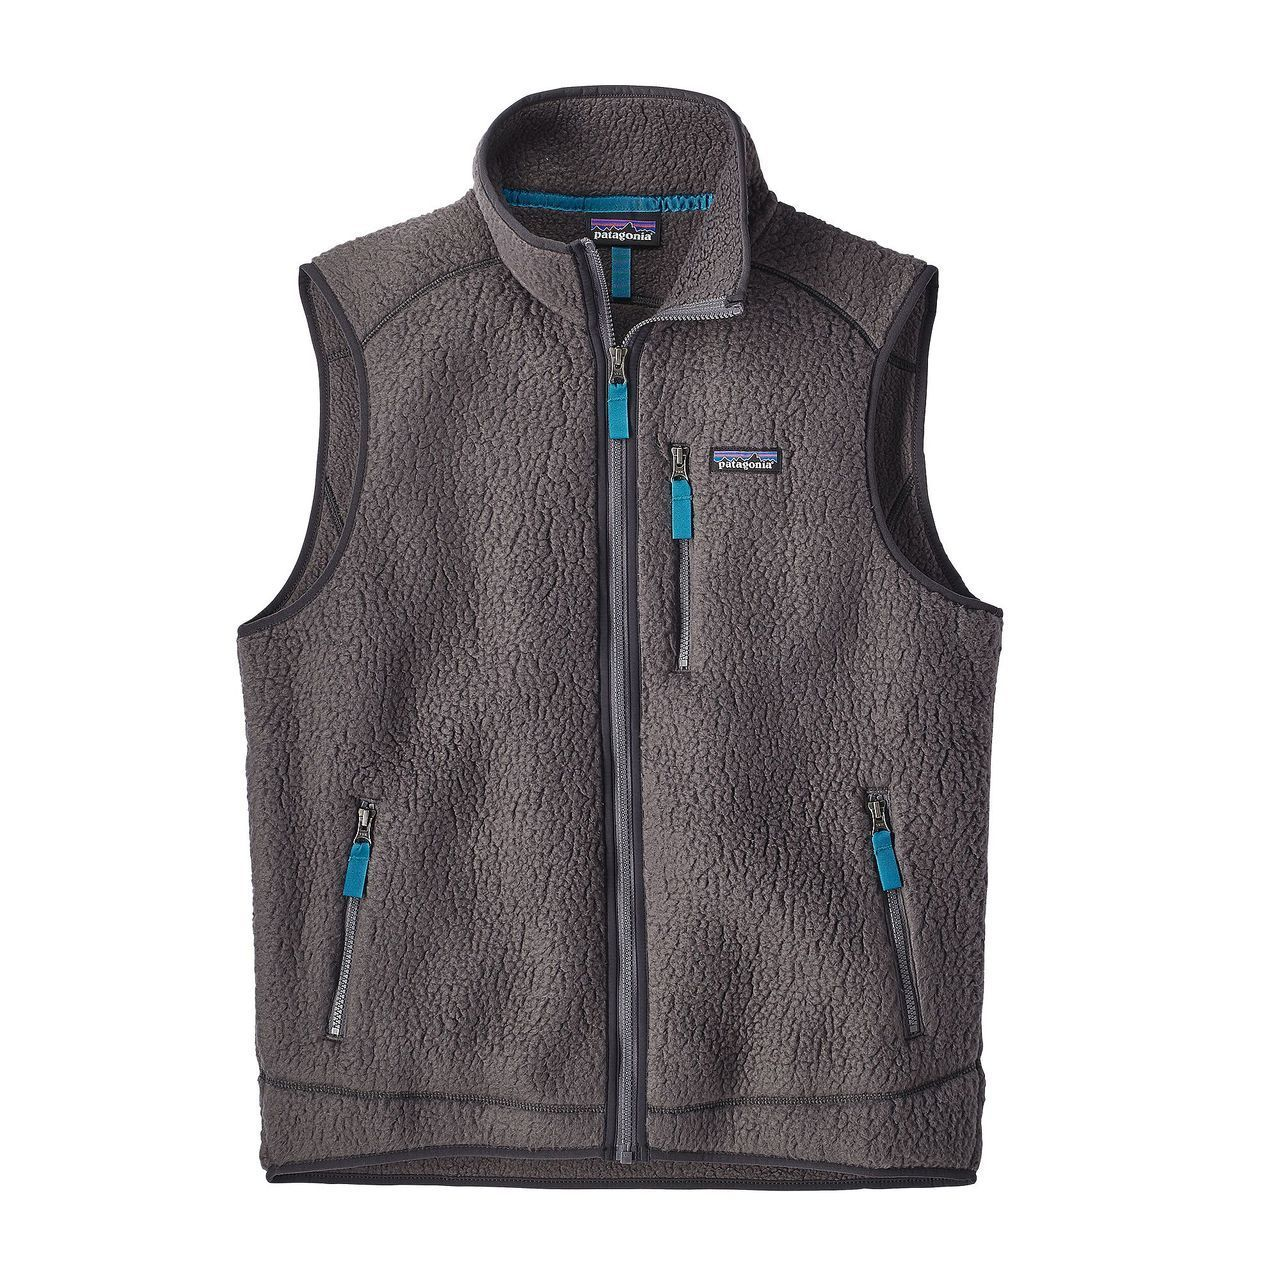 Patagonia menus retro pile fleece vest fleece vest patagonia and